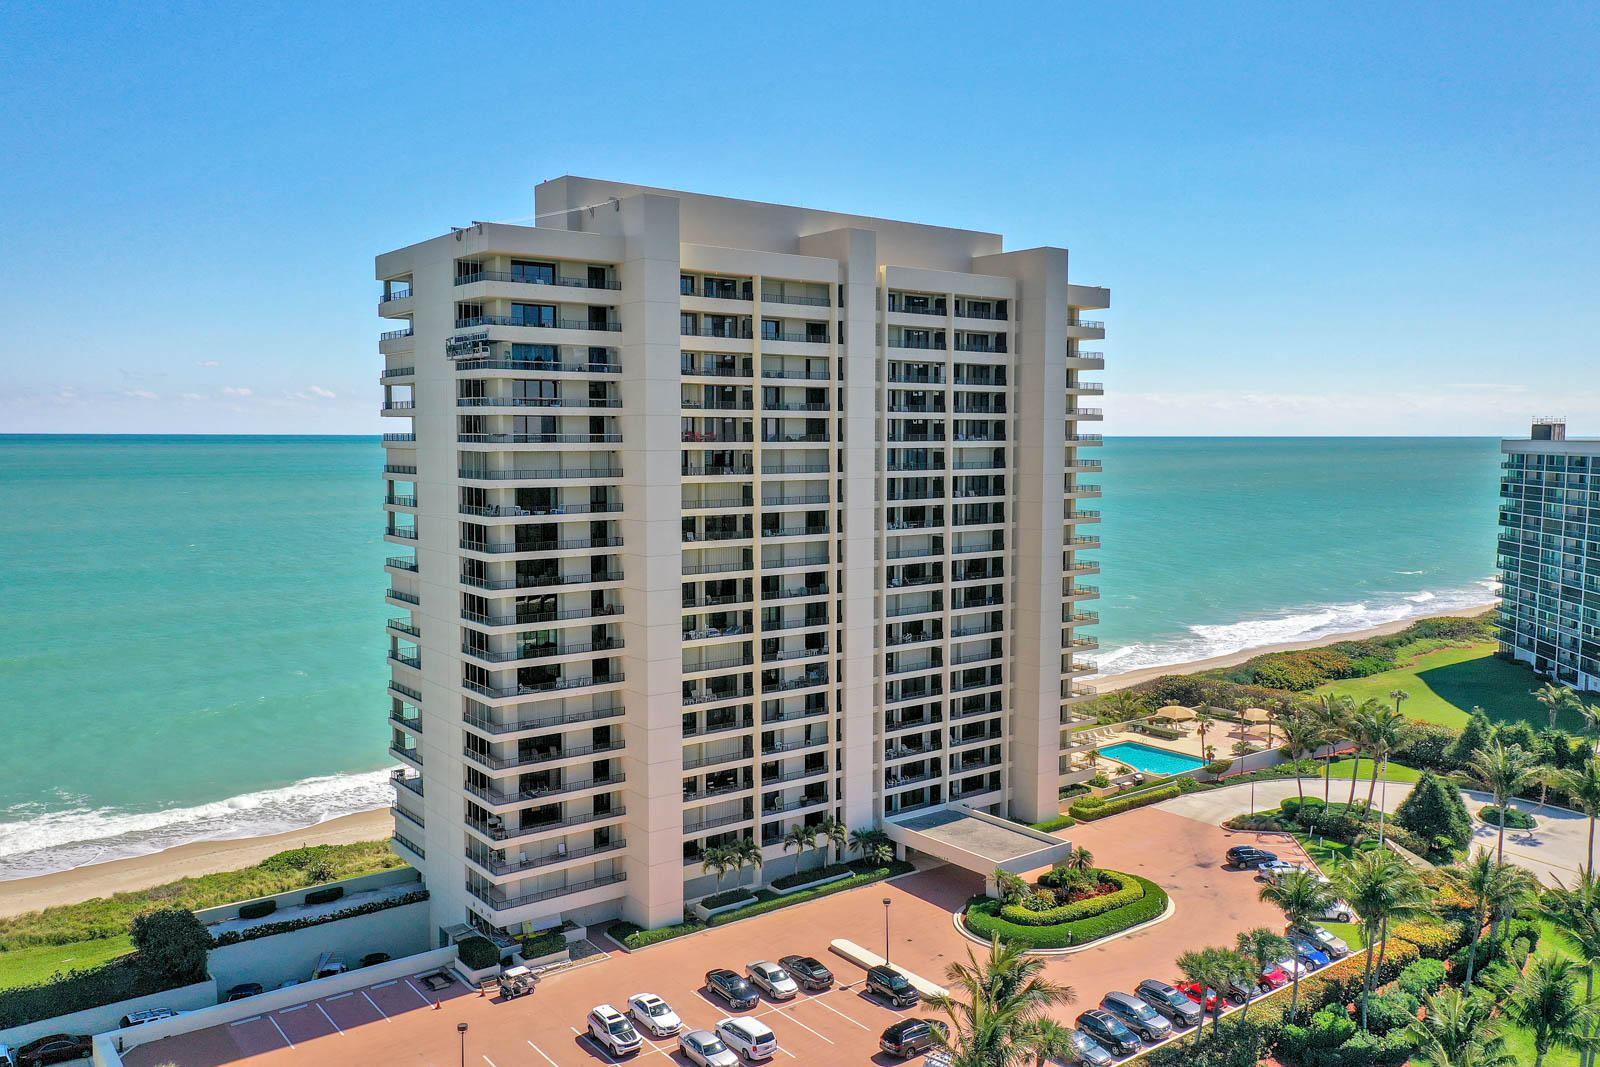 Photo of 8750 S Ocean Drive #832, Jensen Beach, FL 34957 (MLS # RX-10644409)